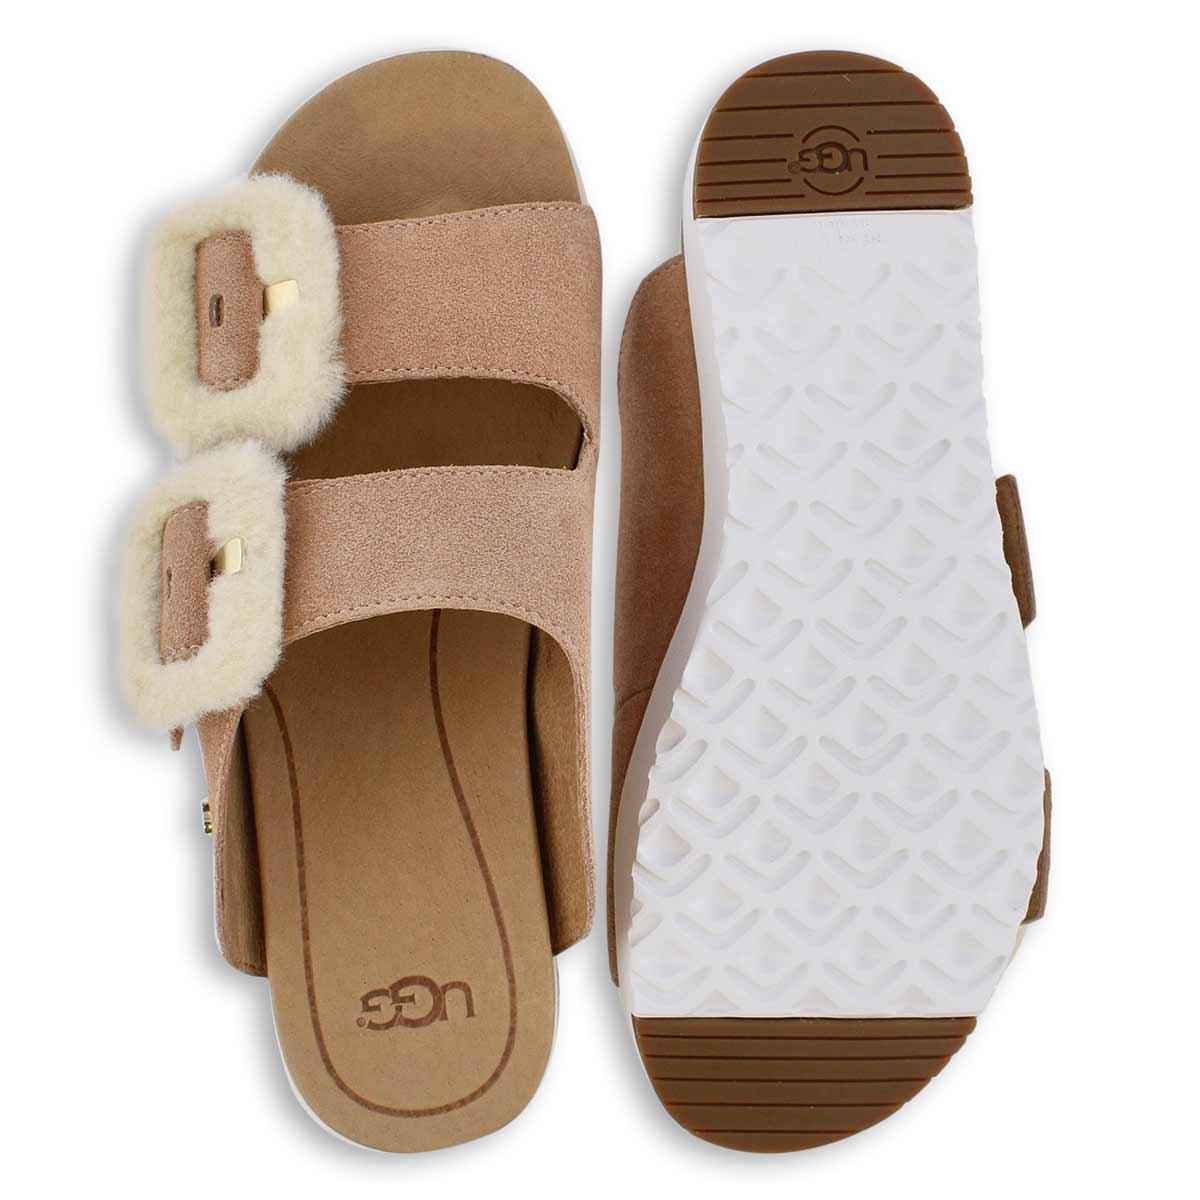 Sandale à enfiler FlUFF INDIO,arroyo,fem